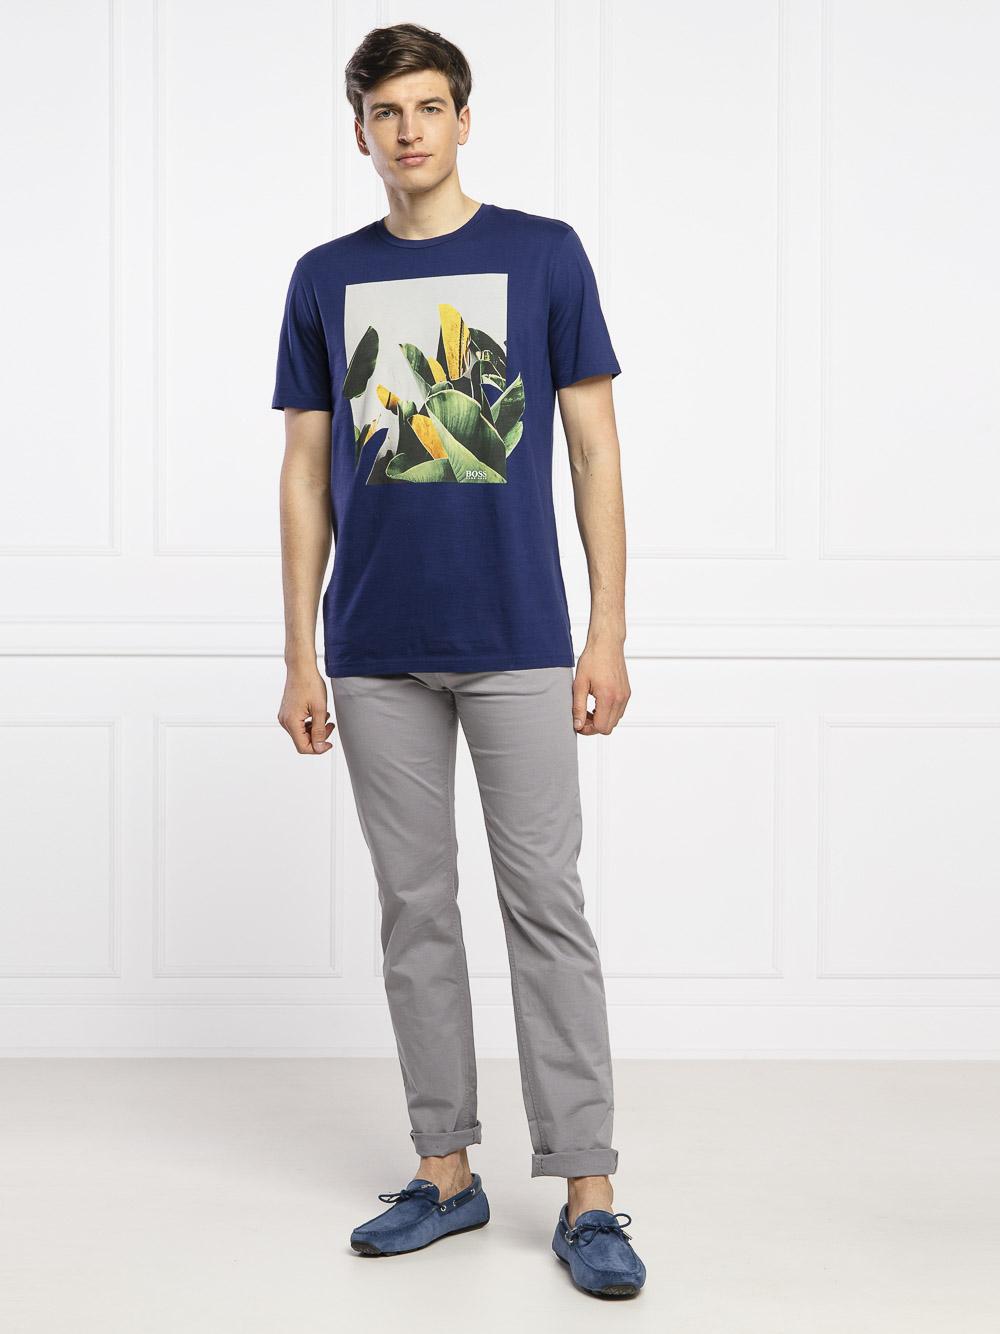 BOSS Μπλούζα T-Shirt 50427922-411 ΜΠΛΕ